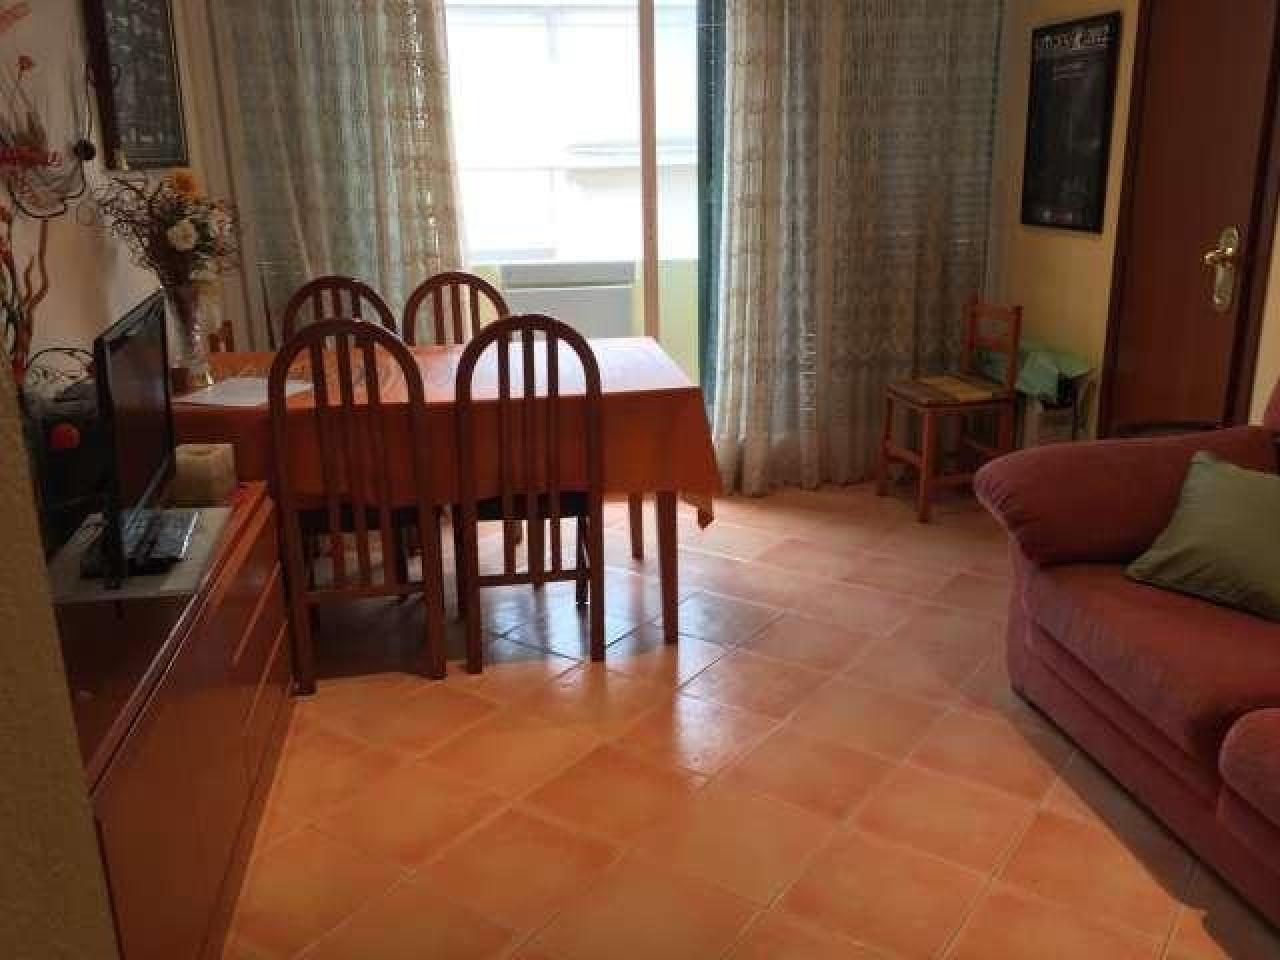 Alquiler de habitaciones Sitges, Barcelona